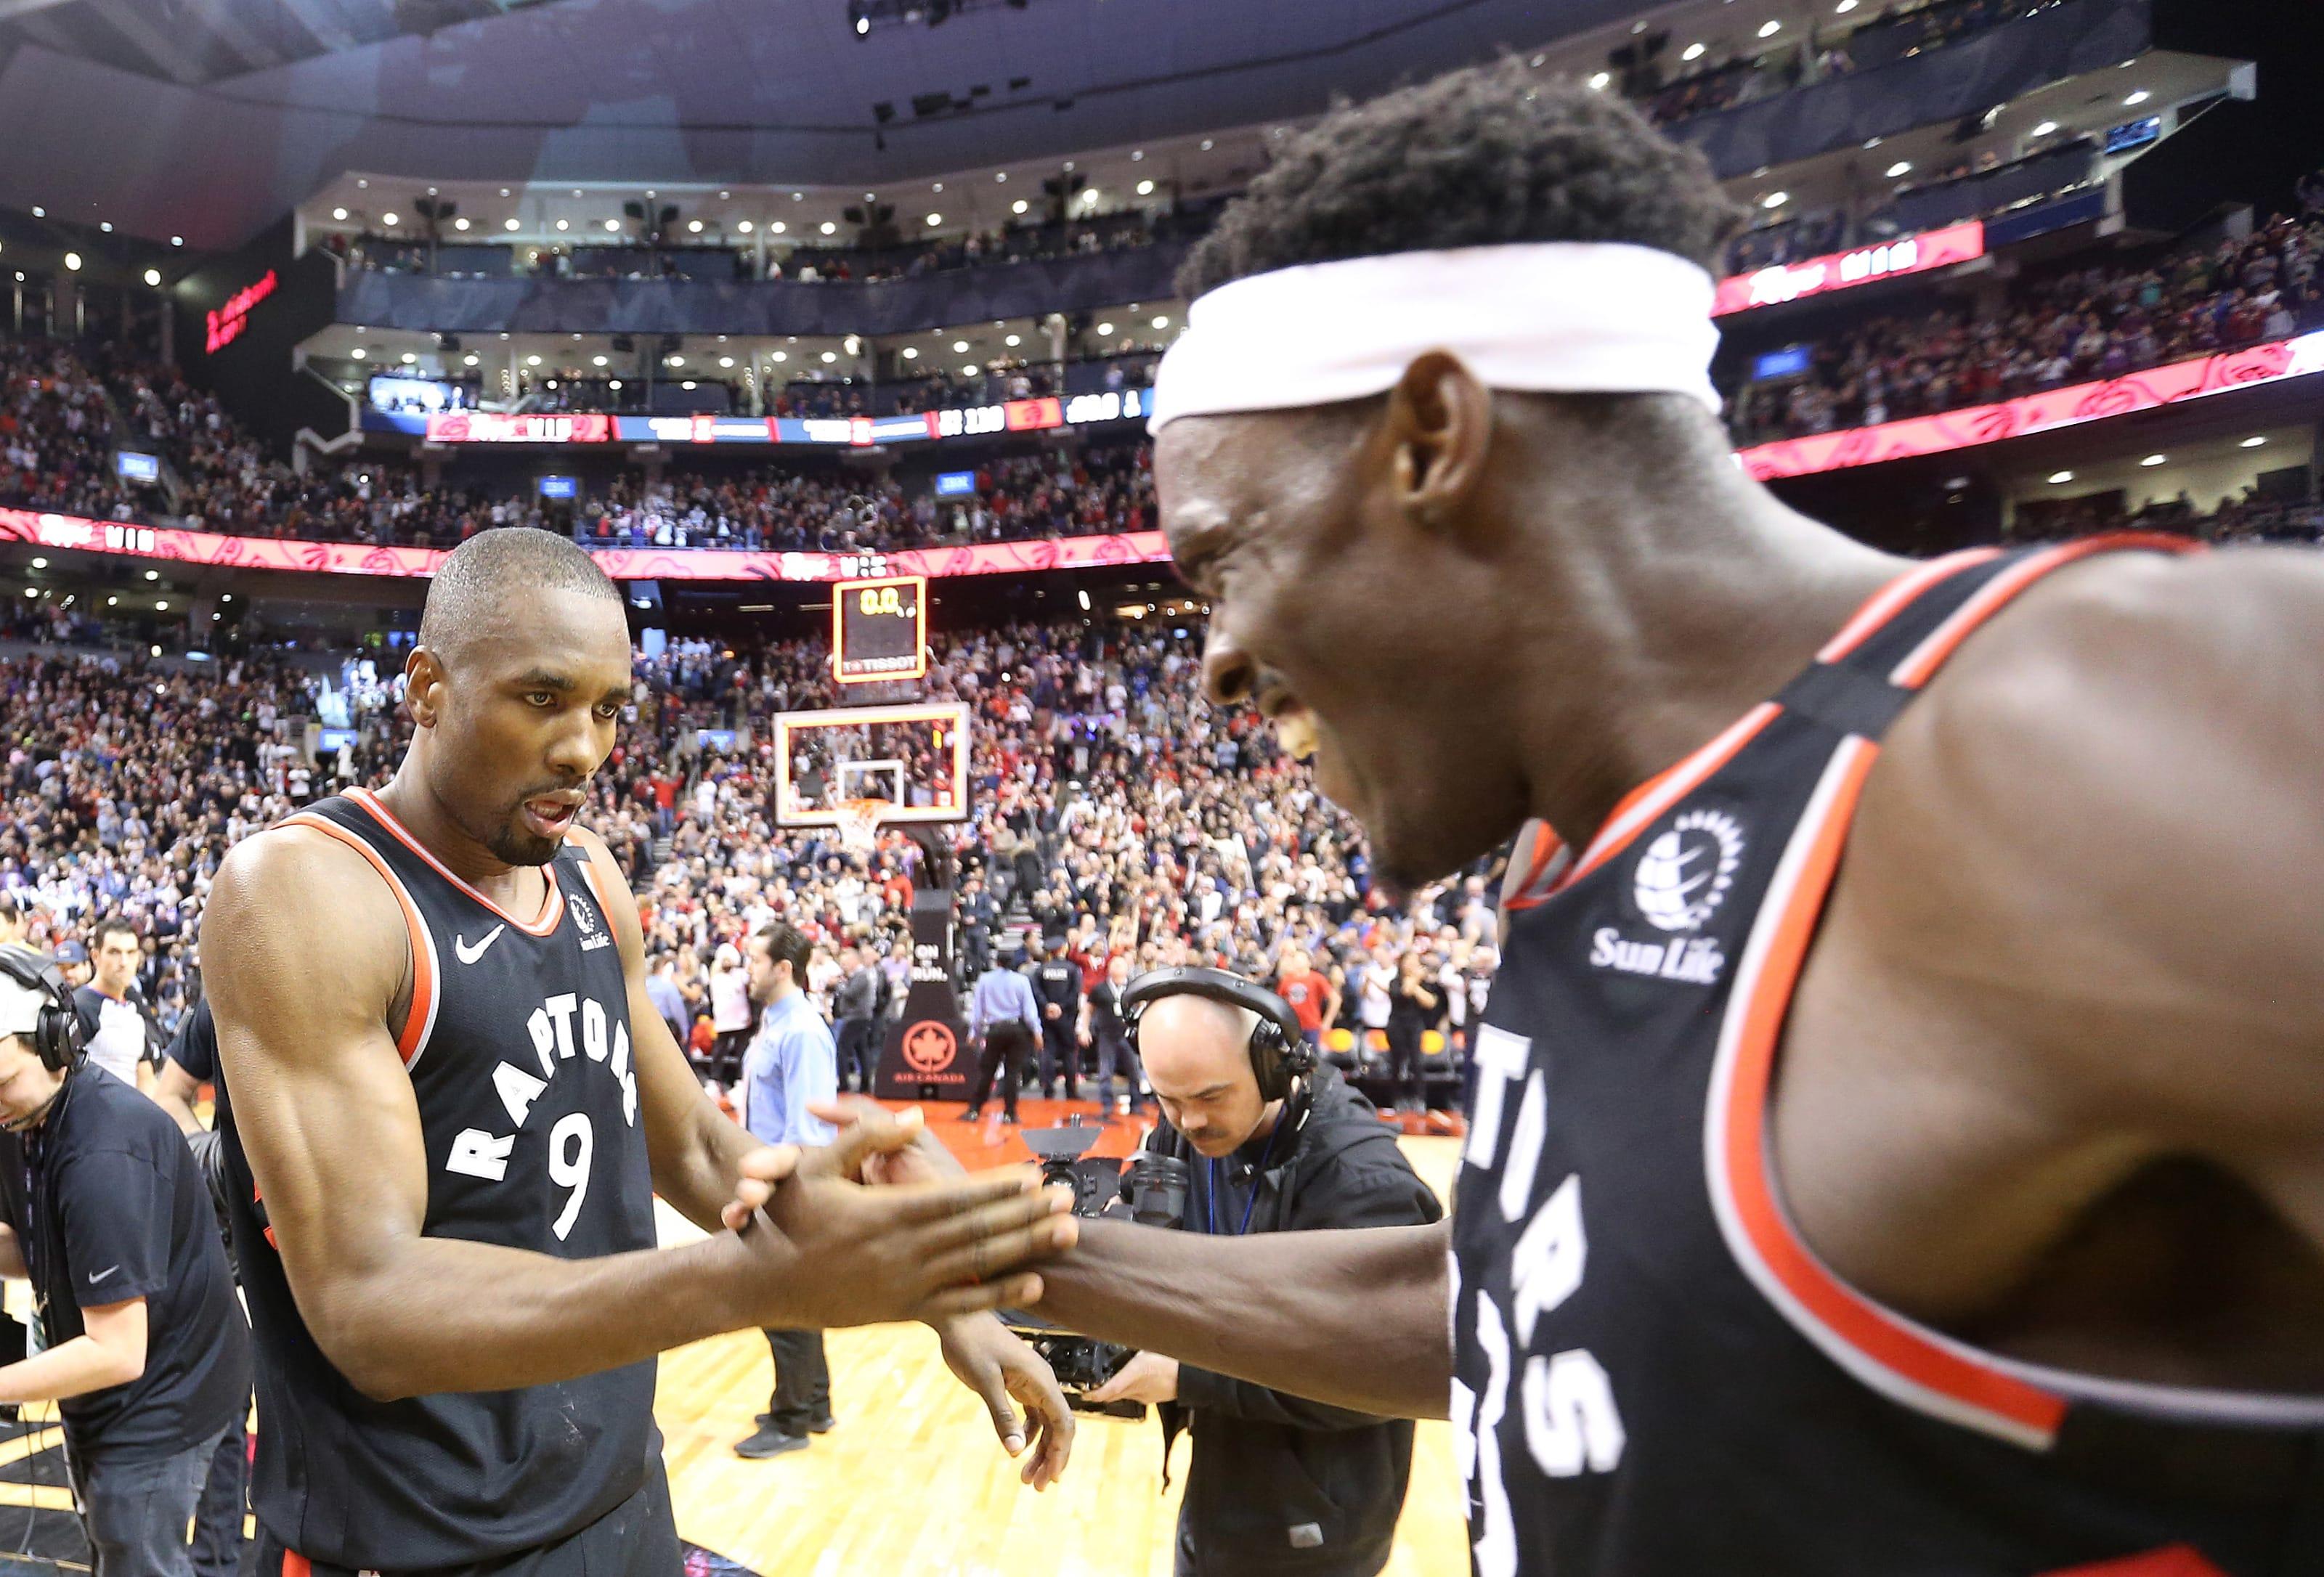 Toronto Raptors Pascal Siakam and Serge Ibaka celebrate